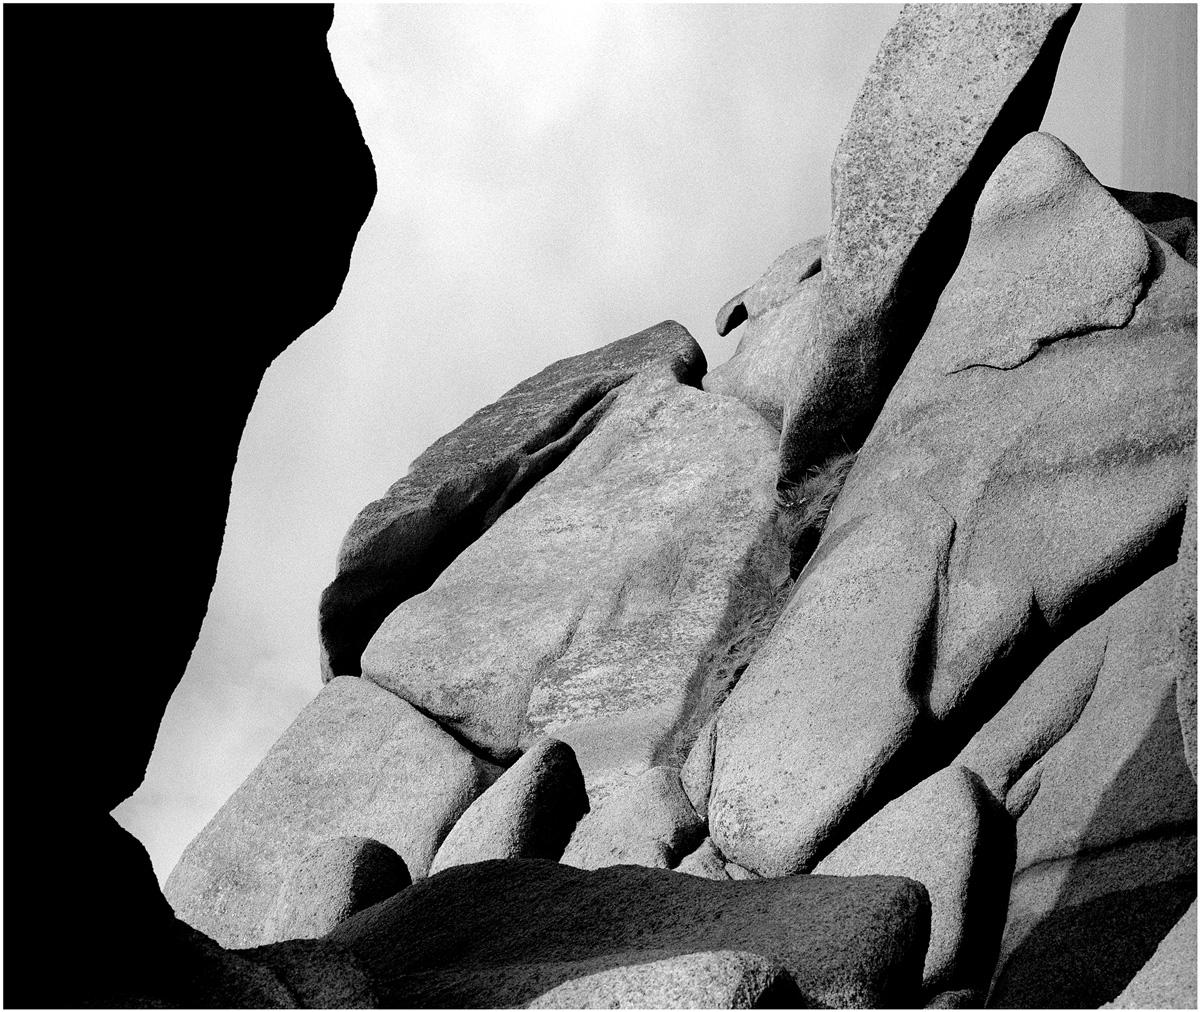 Celtic Rocks 028 – 85_L3.35a